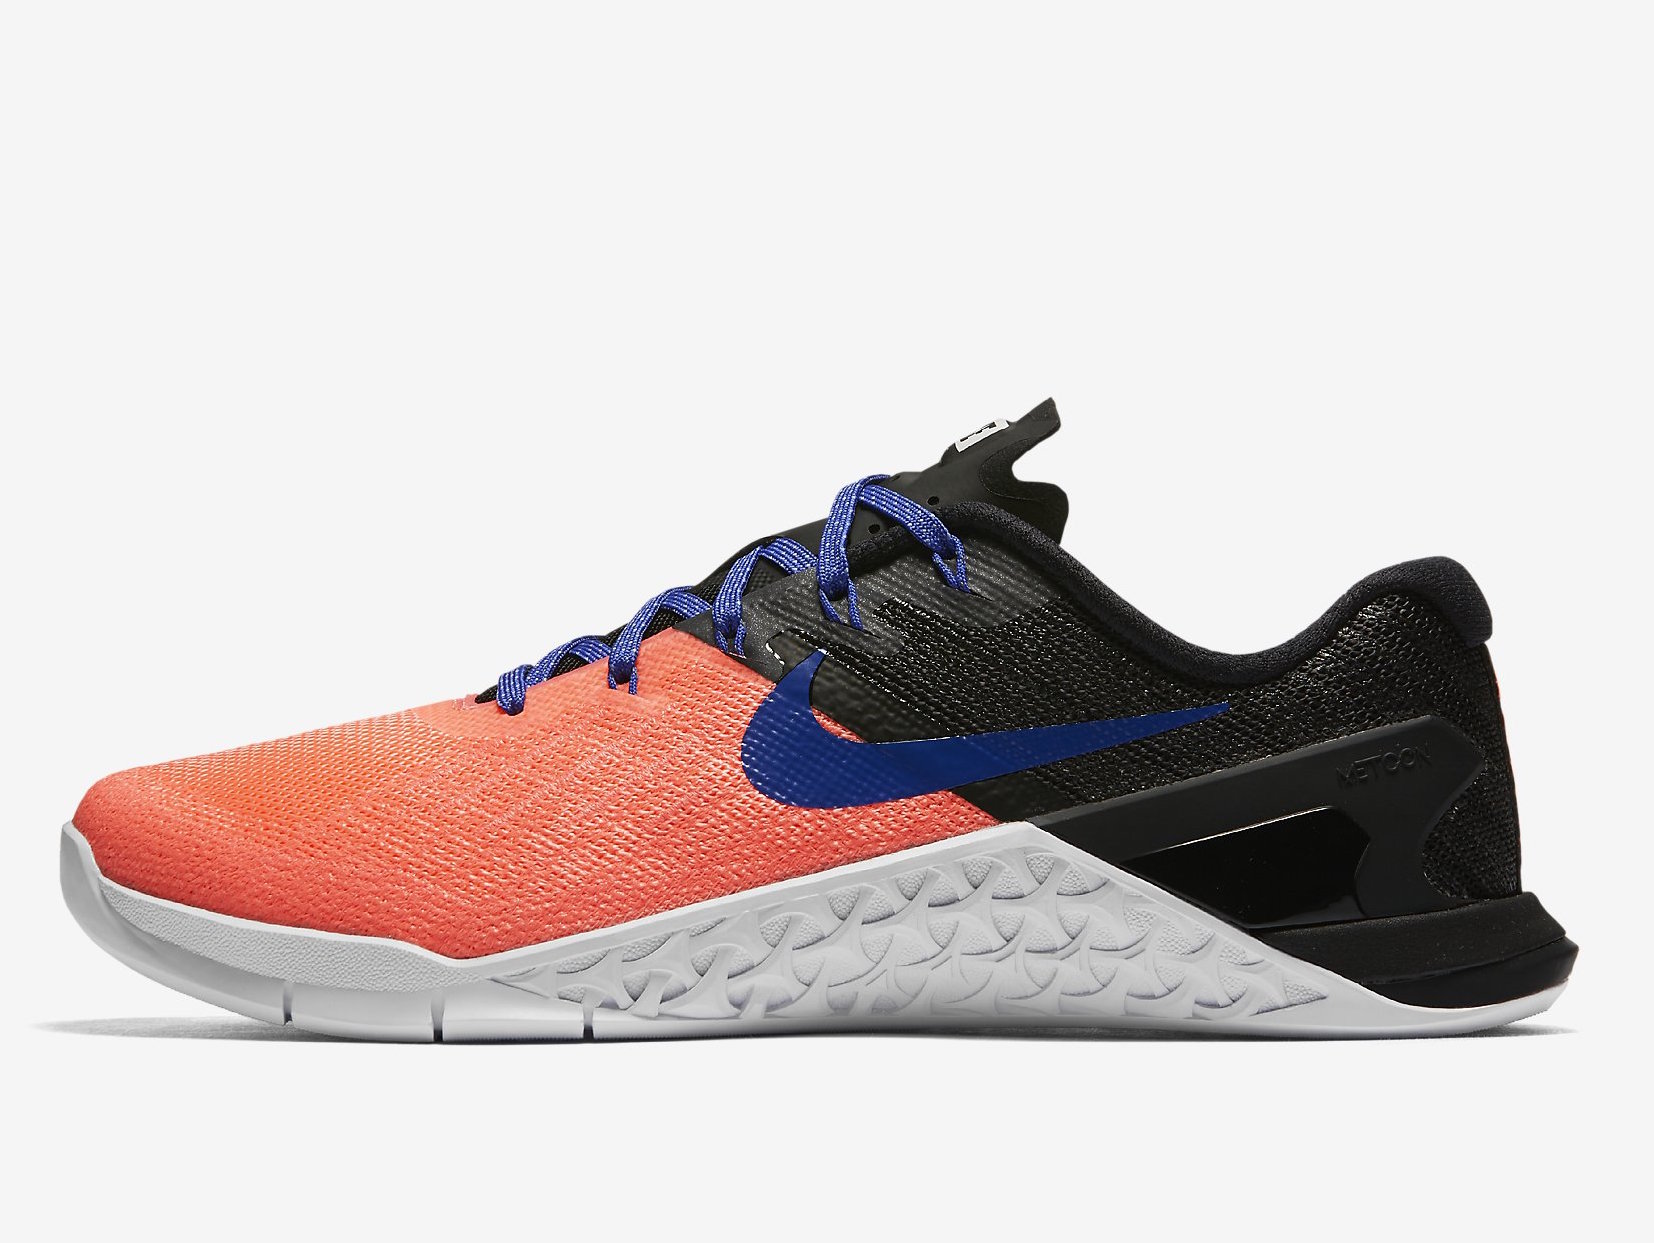 Nike Metcon 3 Sneakers